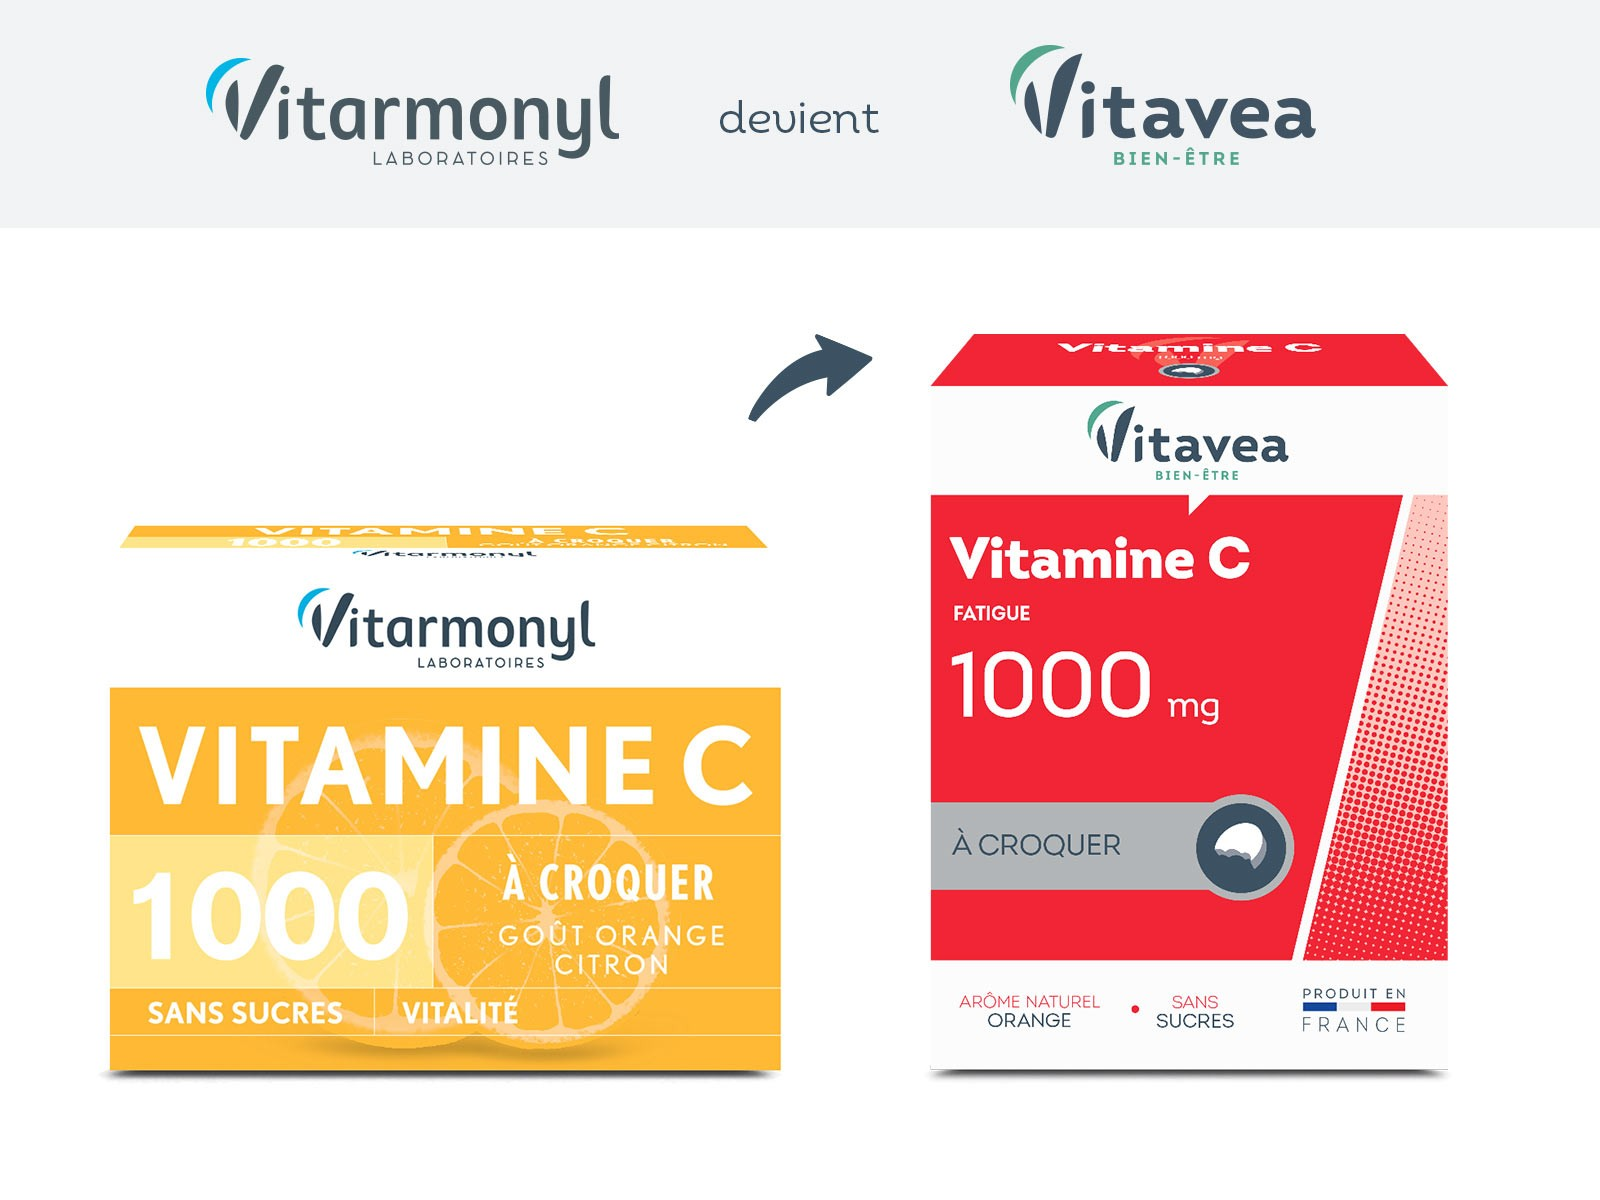 Image Vitamine C 1000 – A croquer